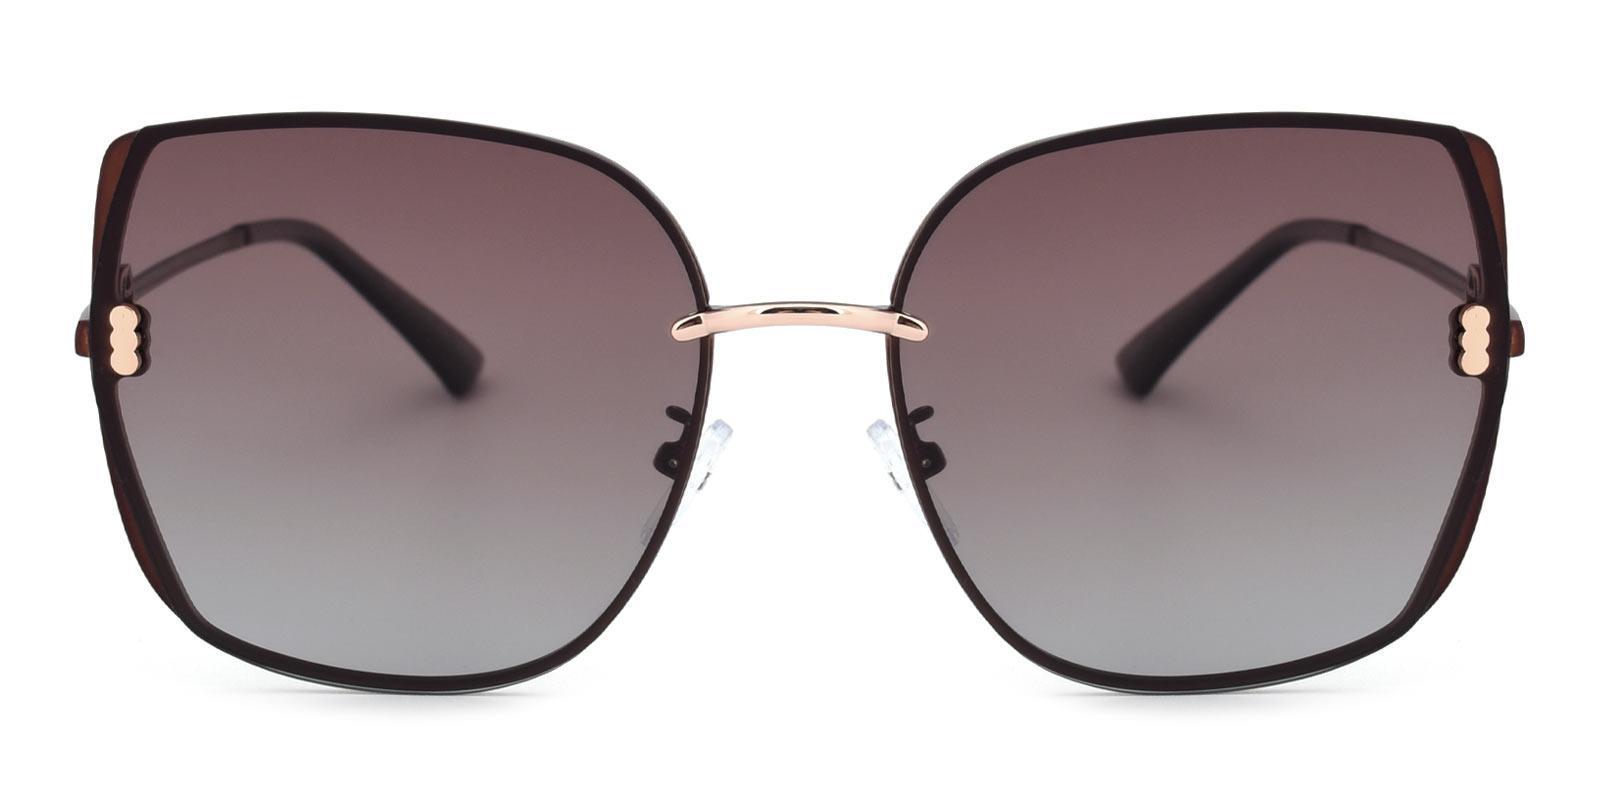 Zed-Brown-Square-Metal-Sunglasses-detail